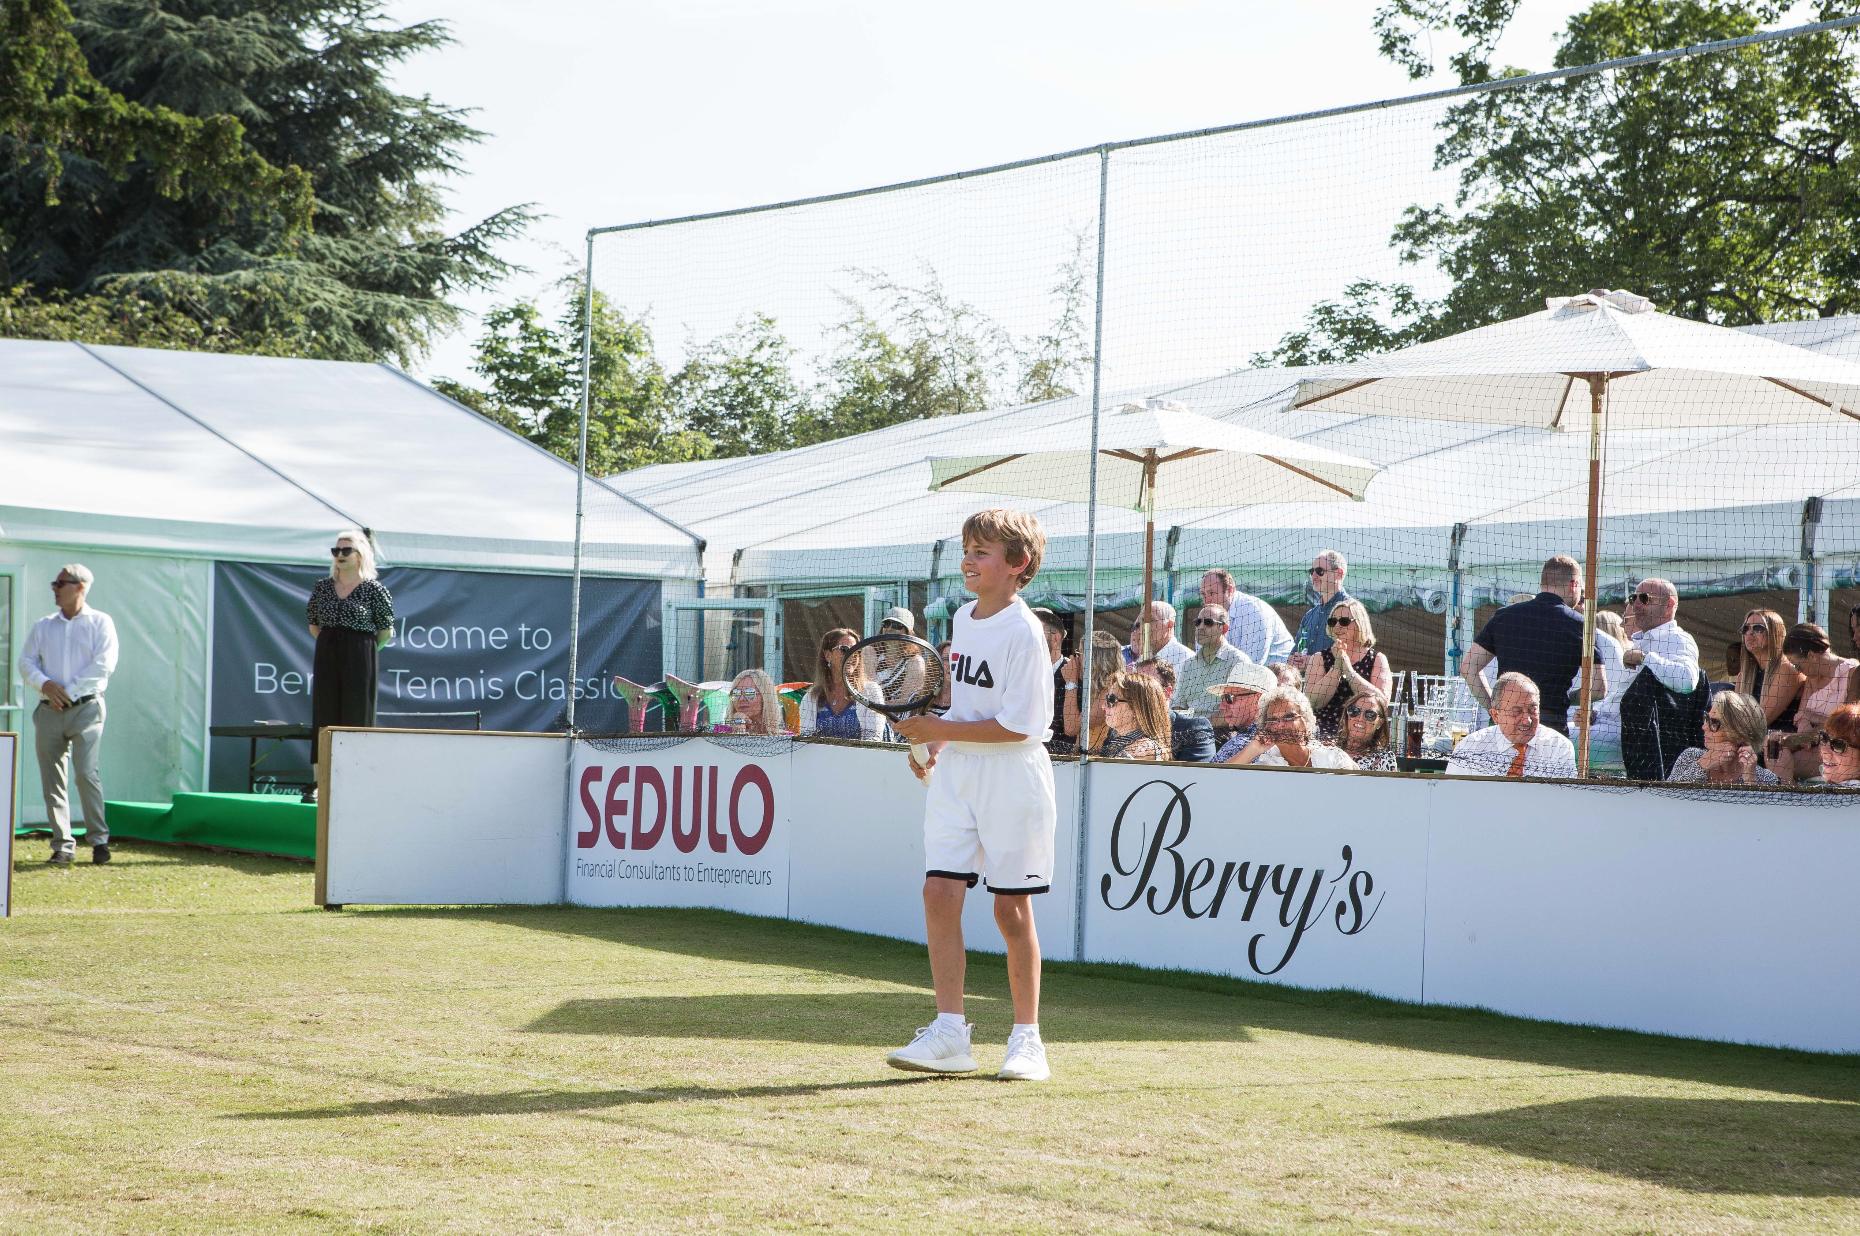 Berry's Tennis